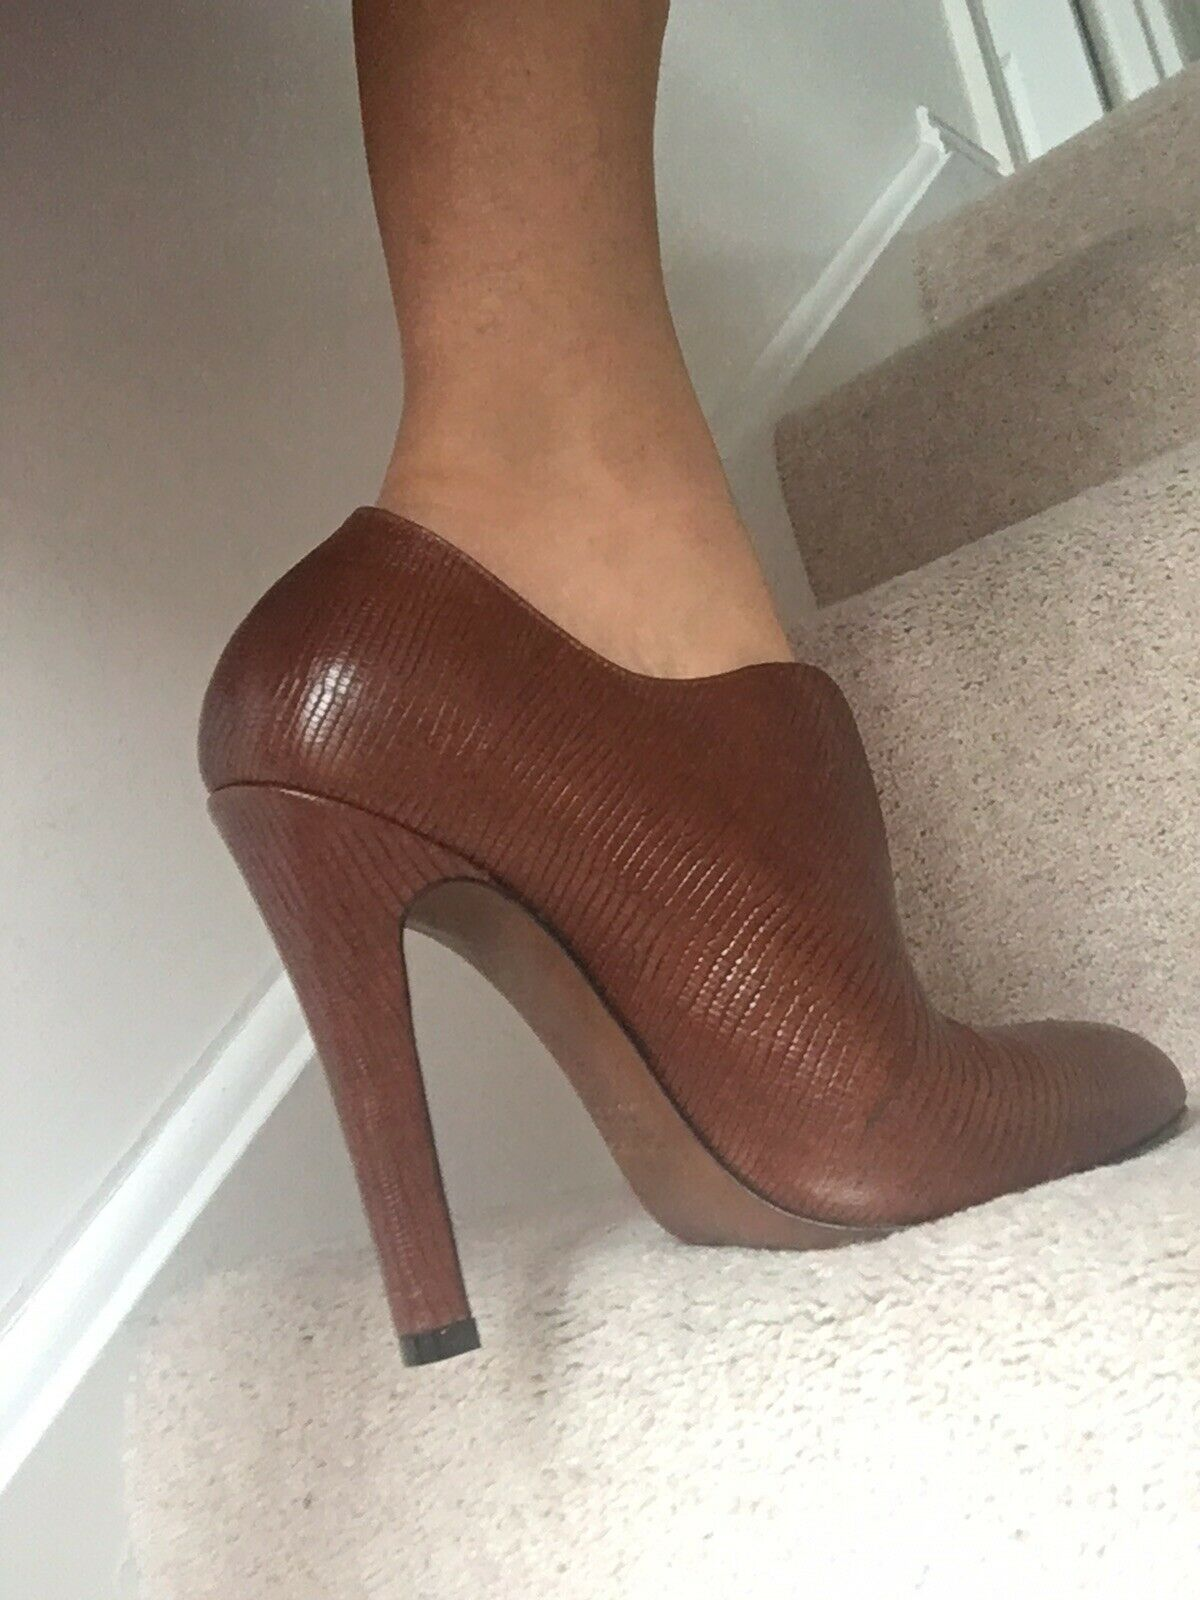 Kallisté all leather heels 4.5 Taille38 5uk PPr